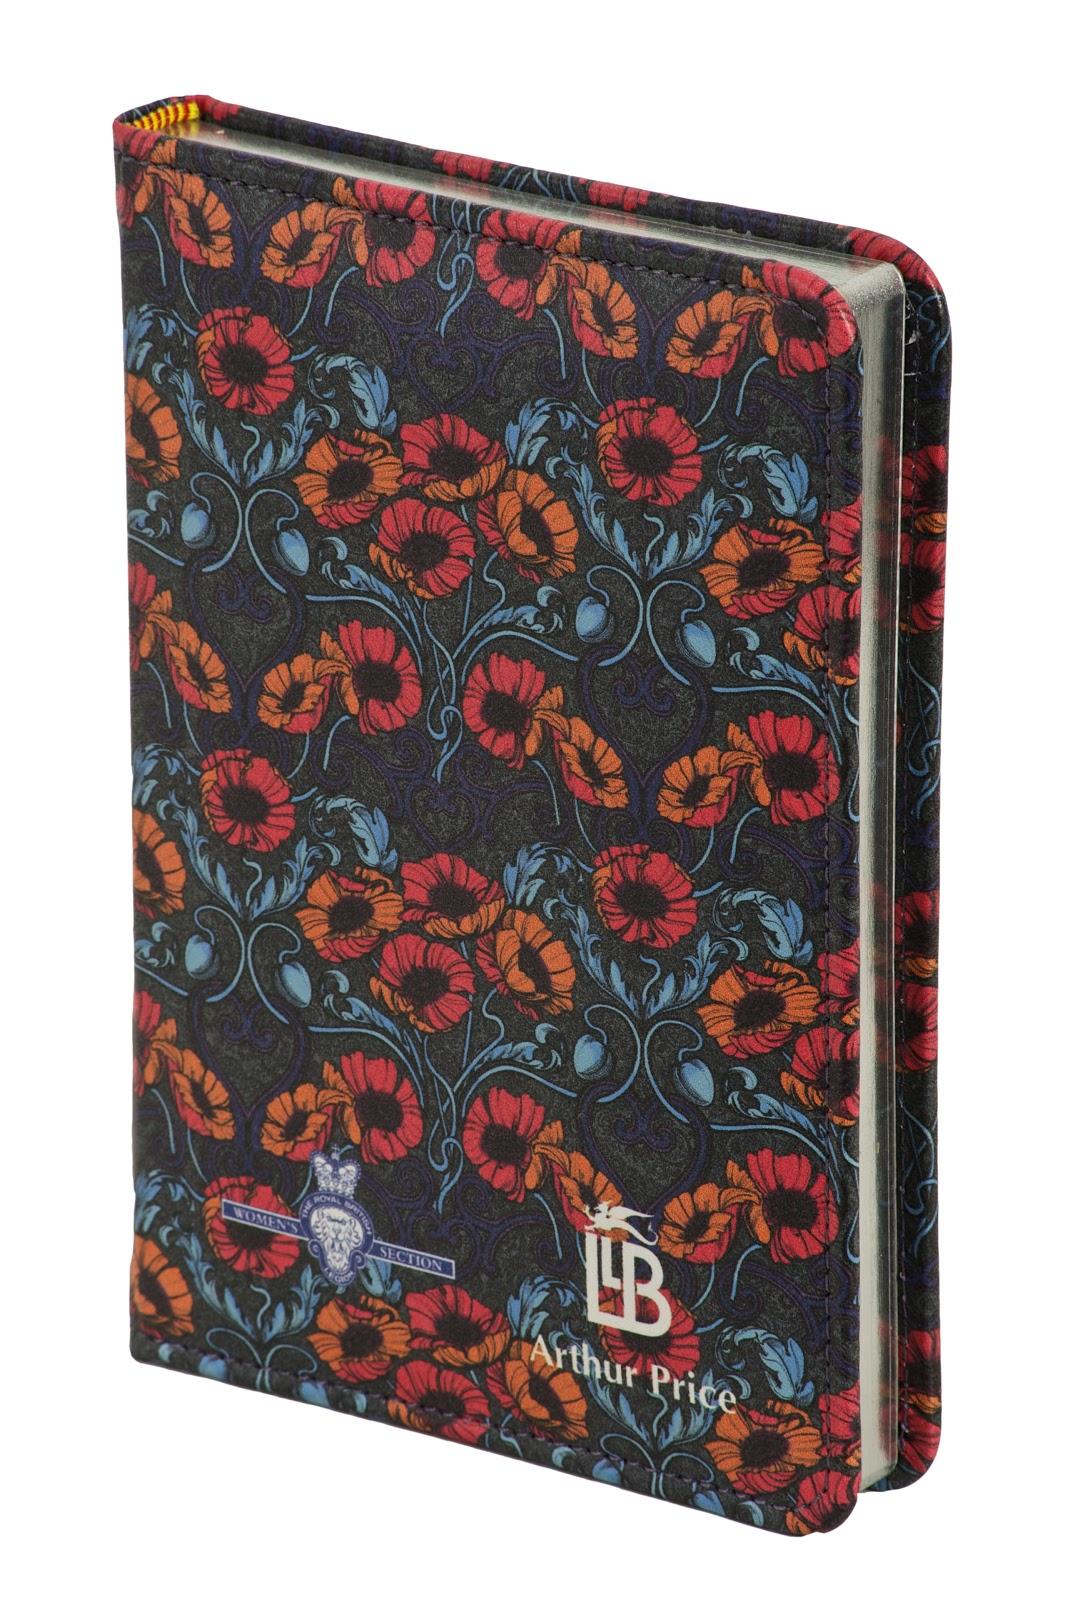 http://4.bp.blogspot.com/-6BXKzXvO6qQ/UT4Rp2x1TKI/AAAAAAAAAEA/mNyRWN9SxIo/s1600/AP+LLB+Remember+RBL+Notebook.jpg